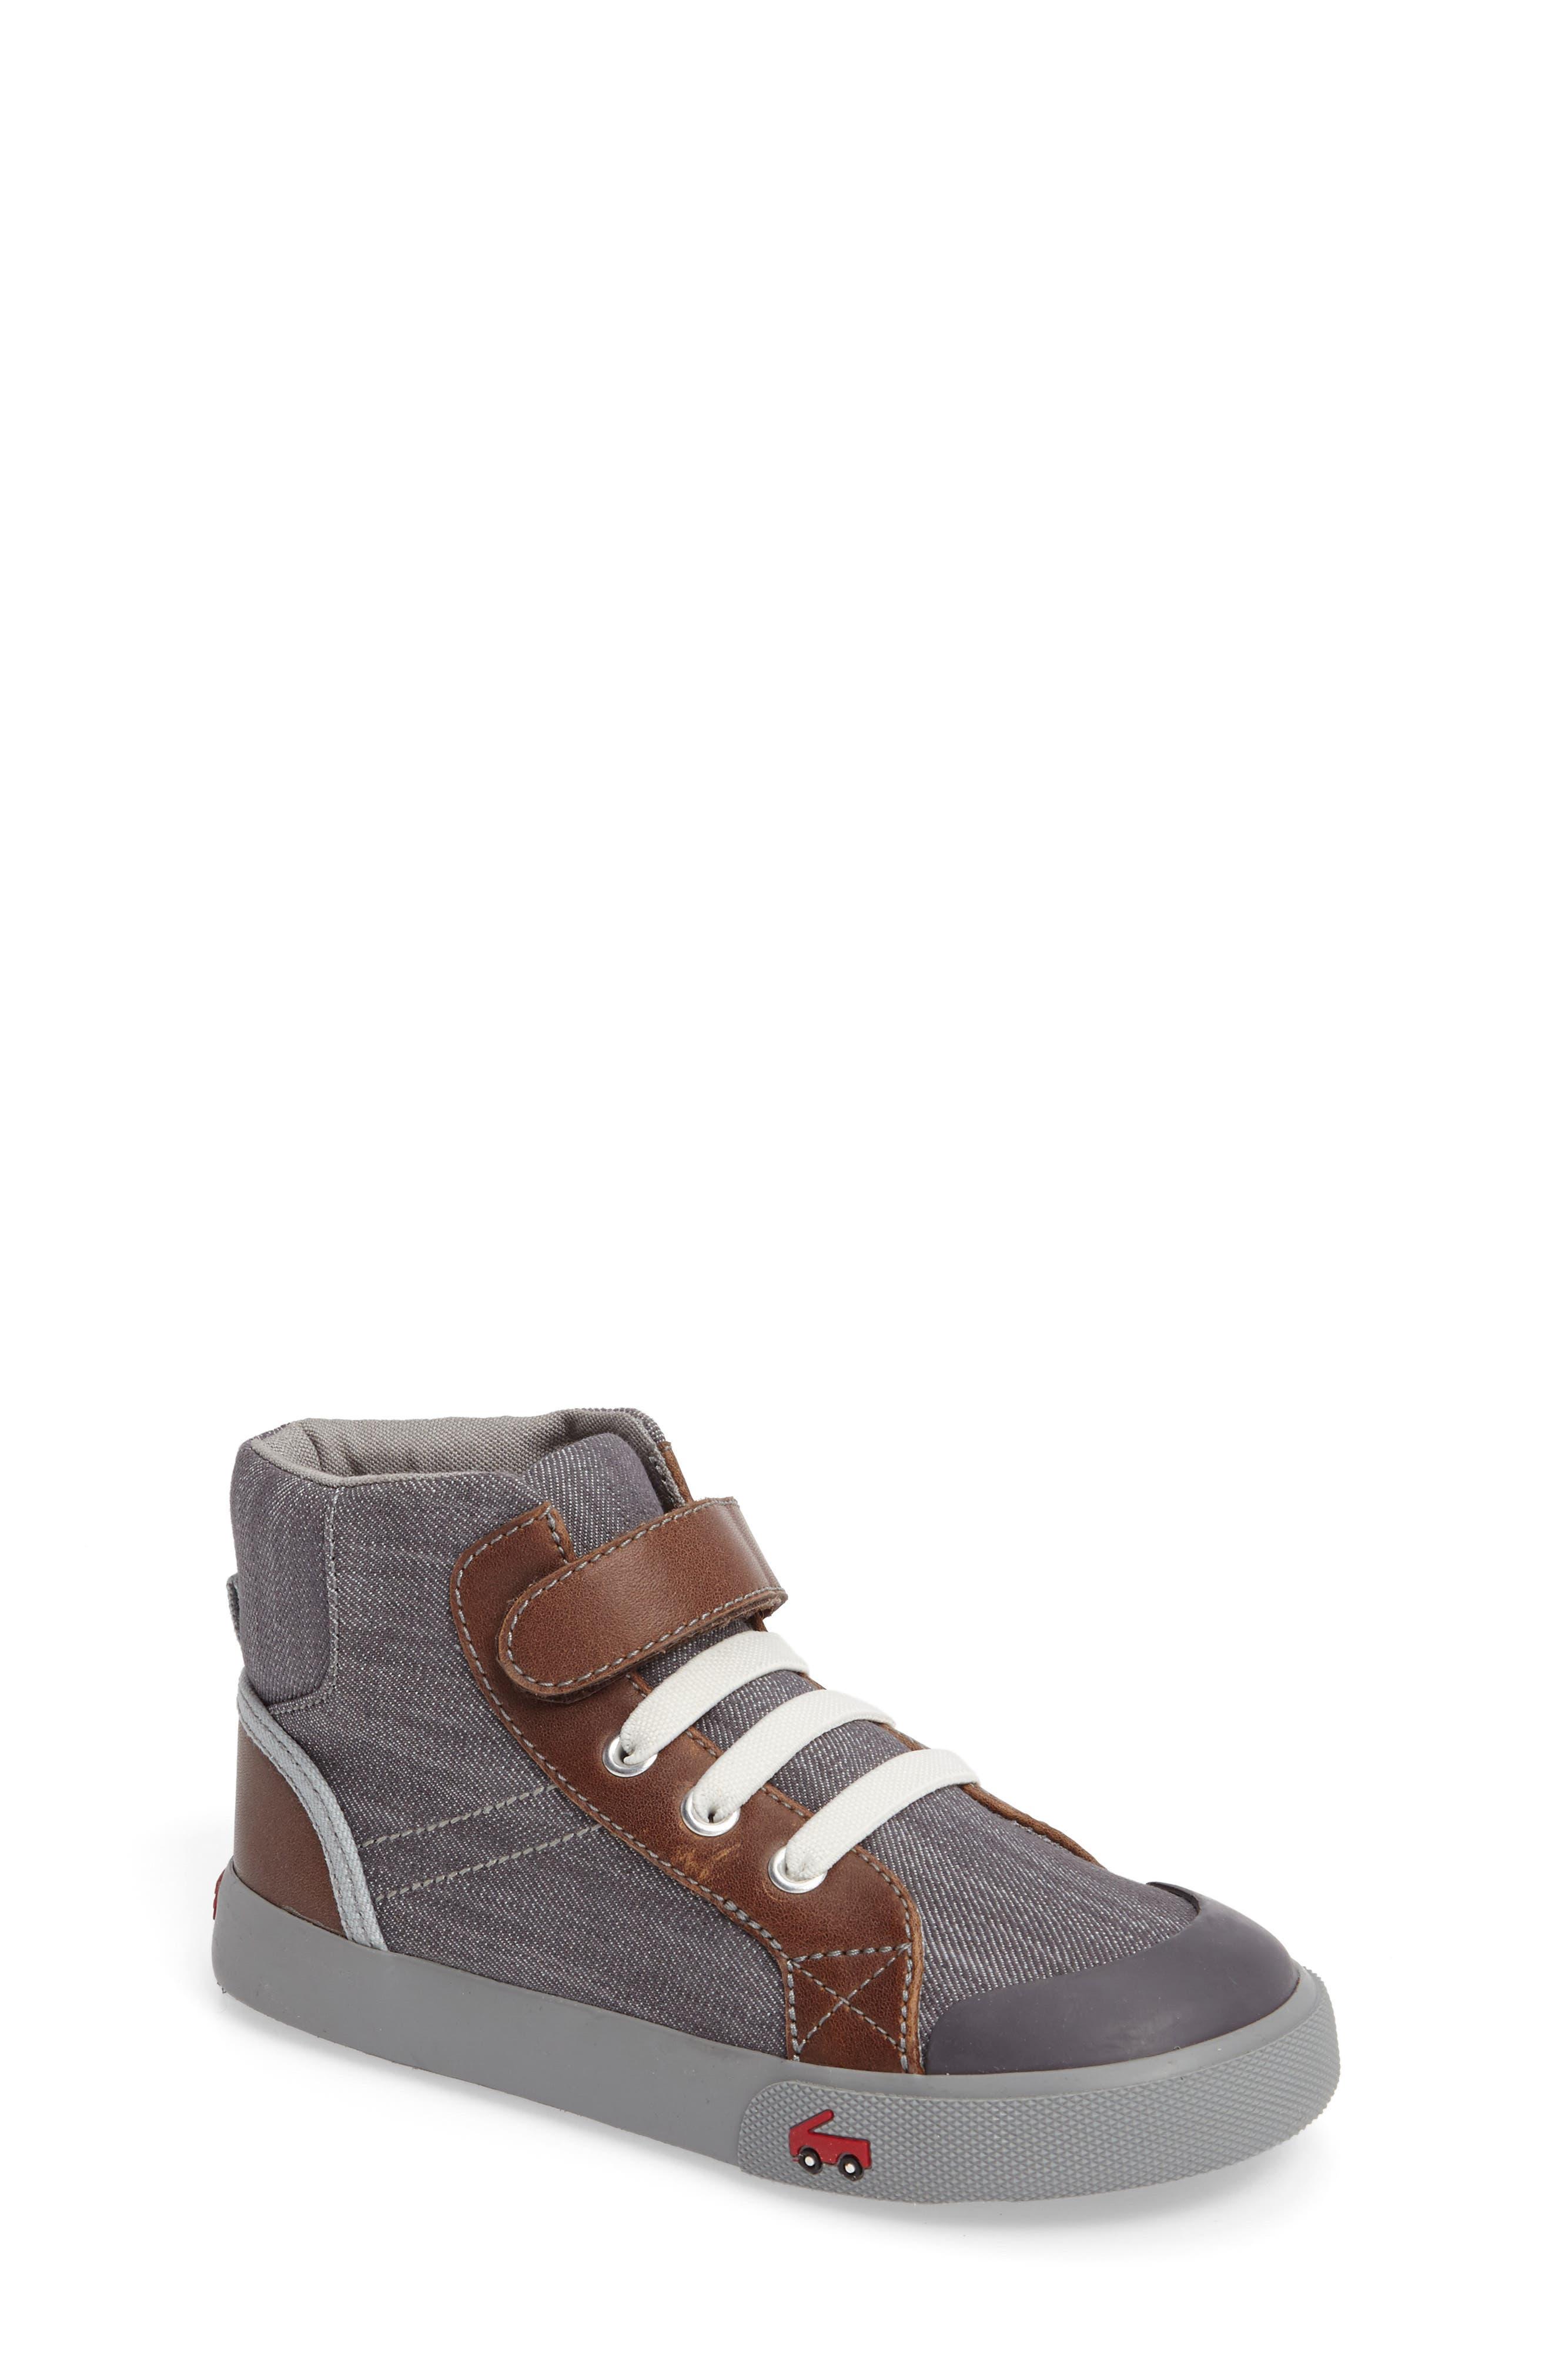 Alternate Image 1 Selected - See Kai Run 'Dane' Sneaker (Baby, Walker & Toddler)